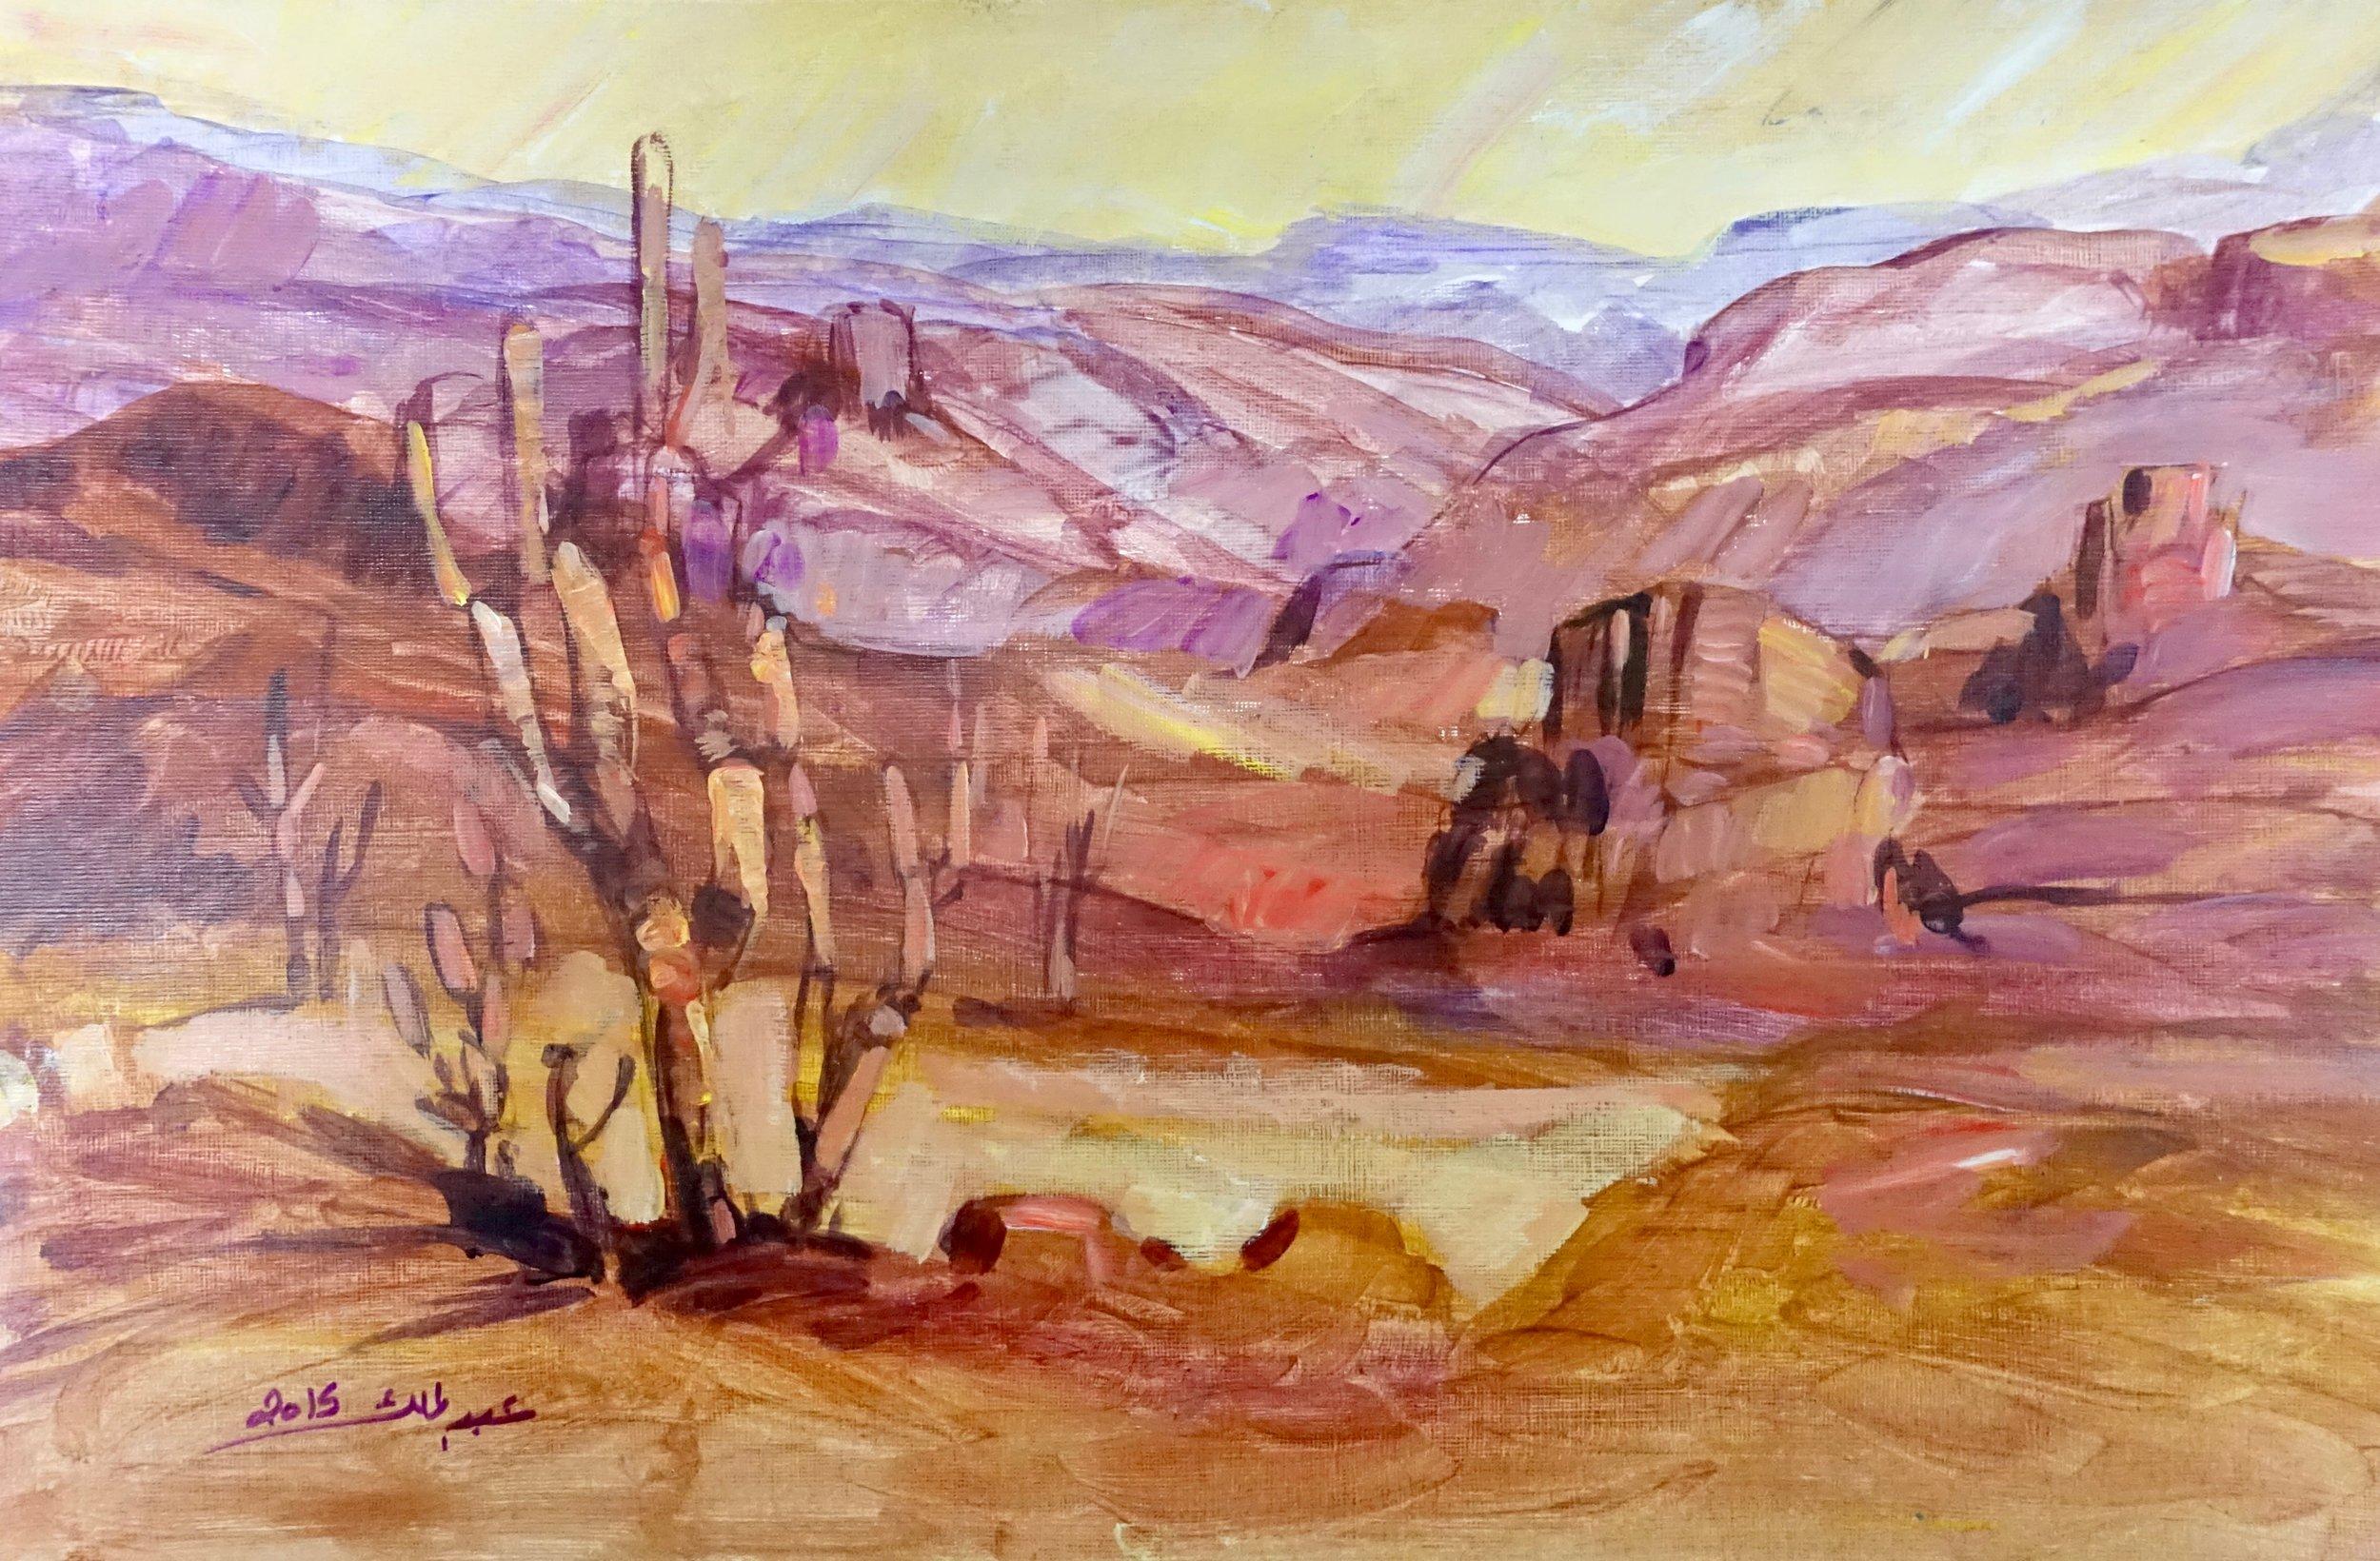 Abdualmalik Abud, Desert Landscape, 2015.